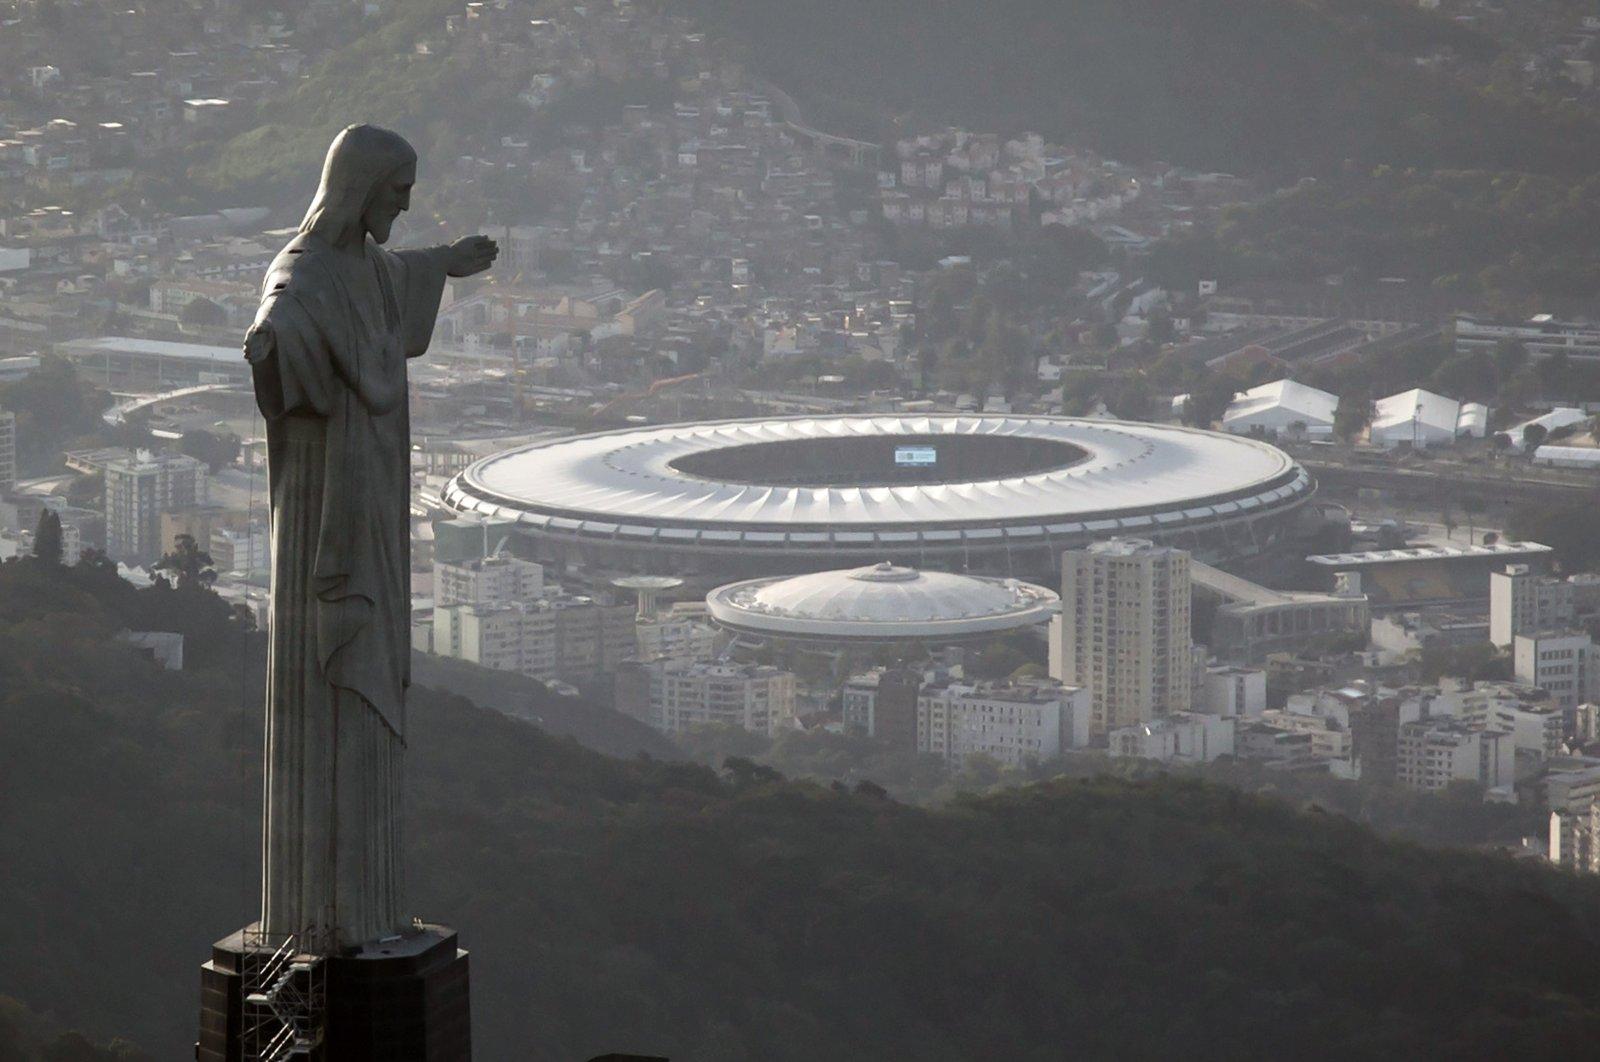 The Maracana stadium behind the Christ the Redeemer statue in Rio de Janeiro, Brazil, May 13, 2014. (AP Photo)